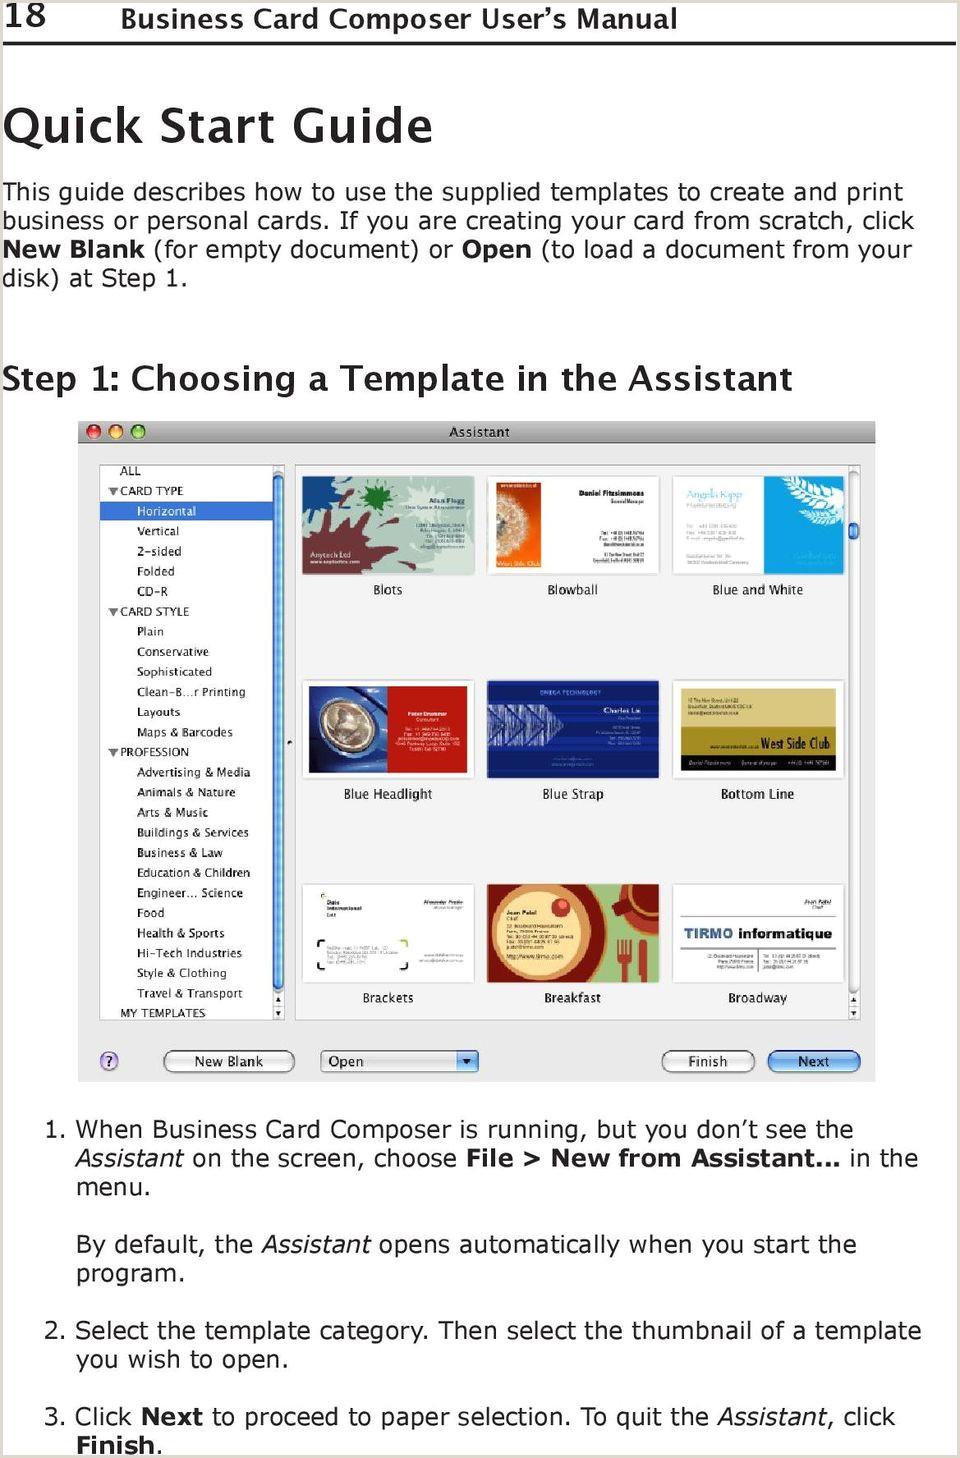 Proper Business Card Format Business Card Poser Pdf Free Download